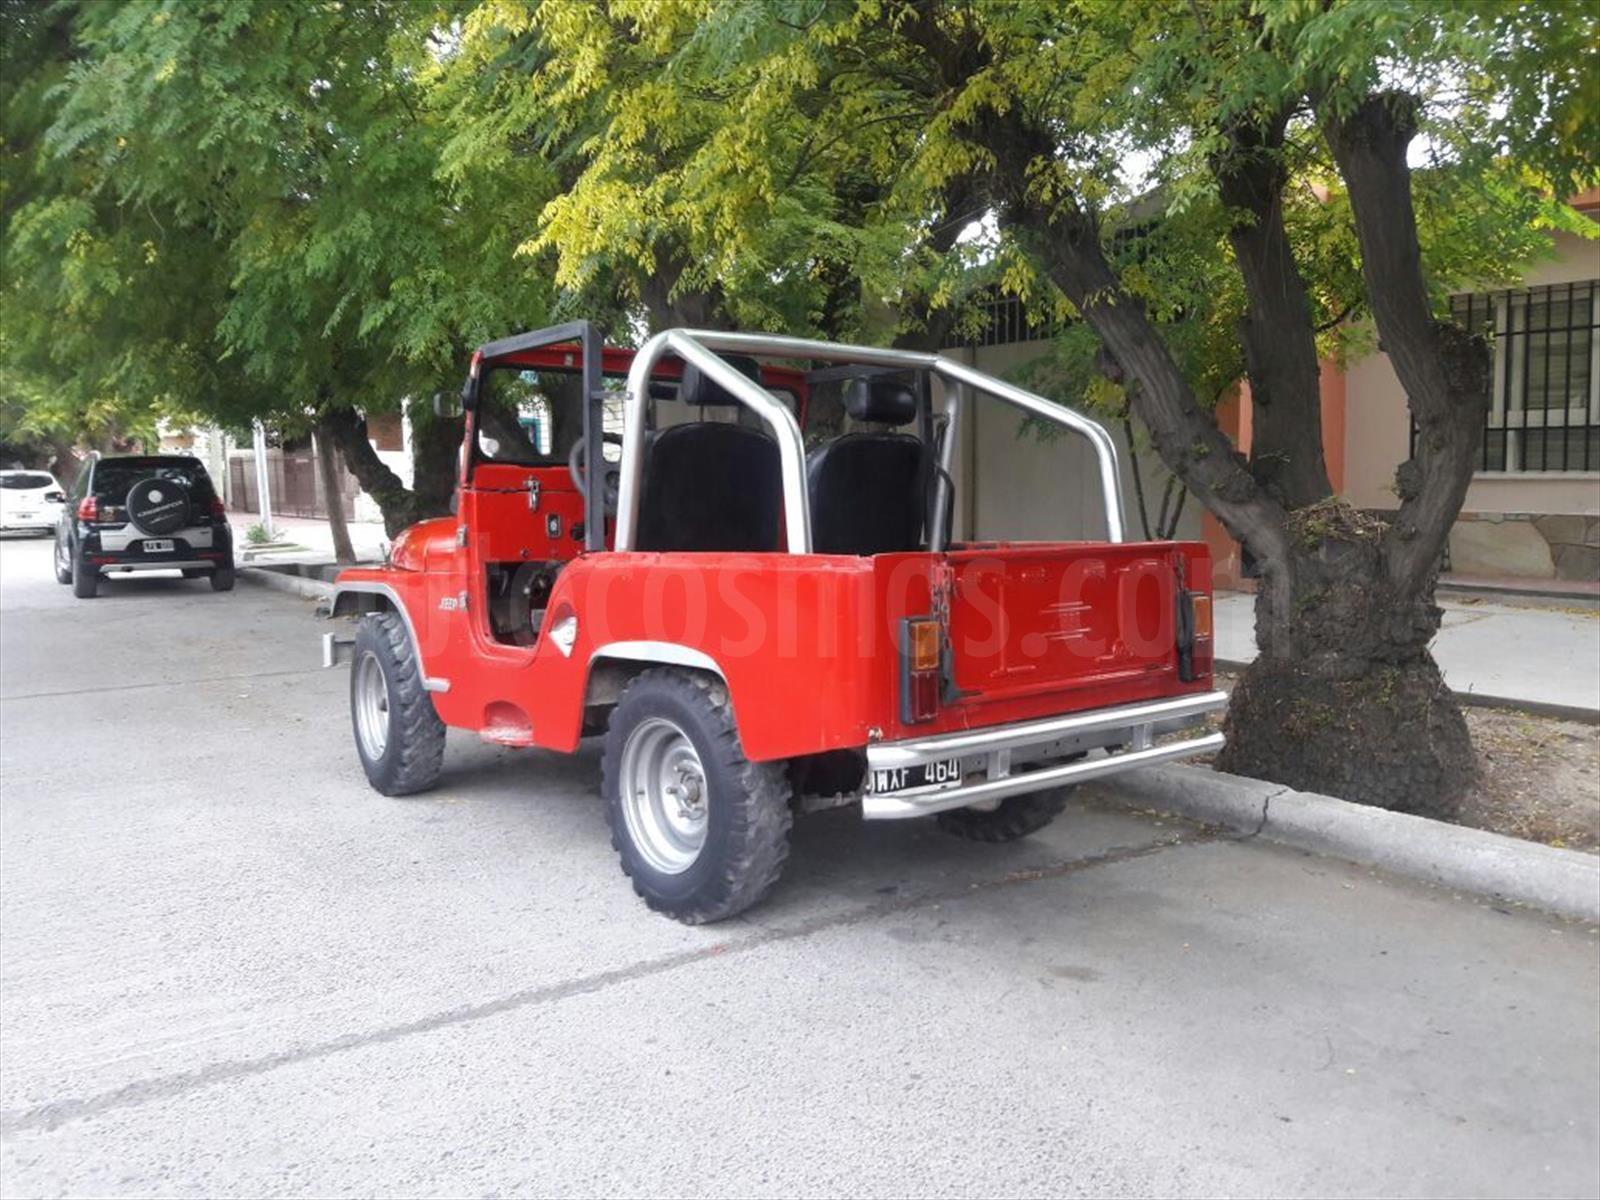 Venta Autos Usado Mendoza Ika Jeep 4x4 Ja 2p